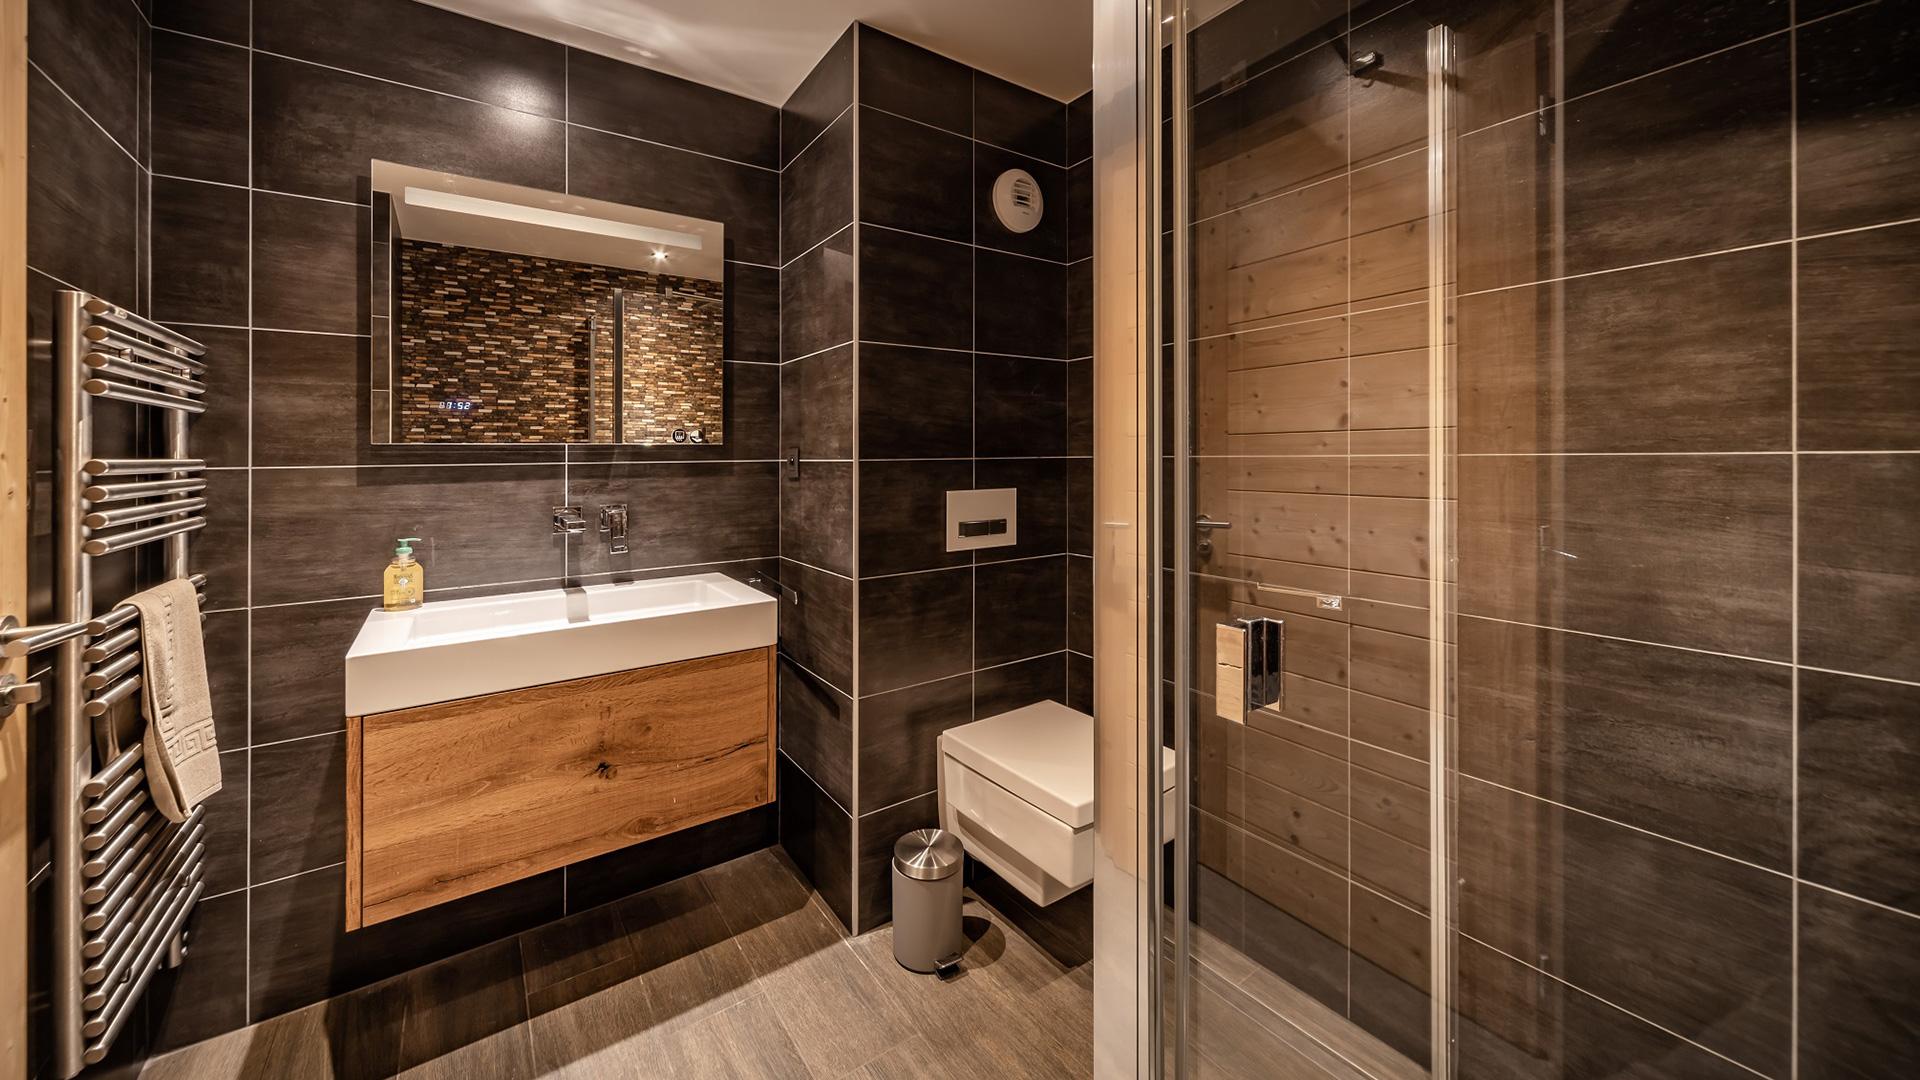 Alkata Penthouse Apartments, France